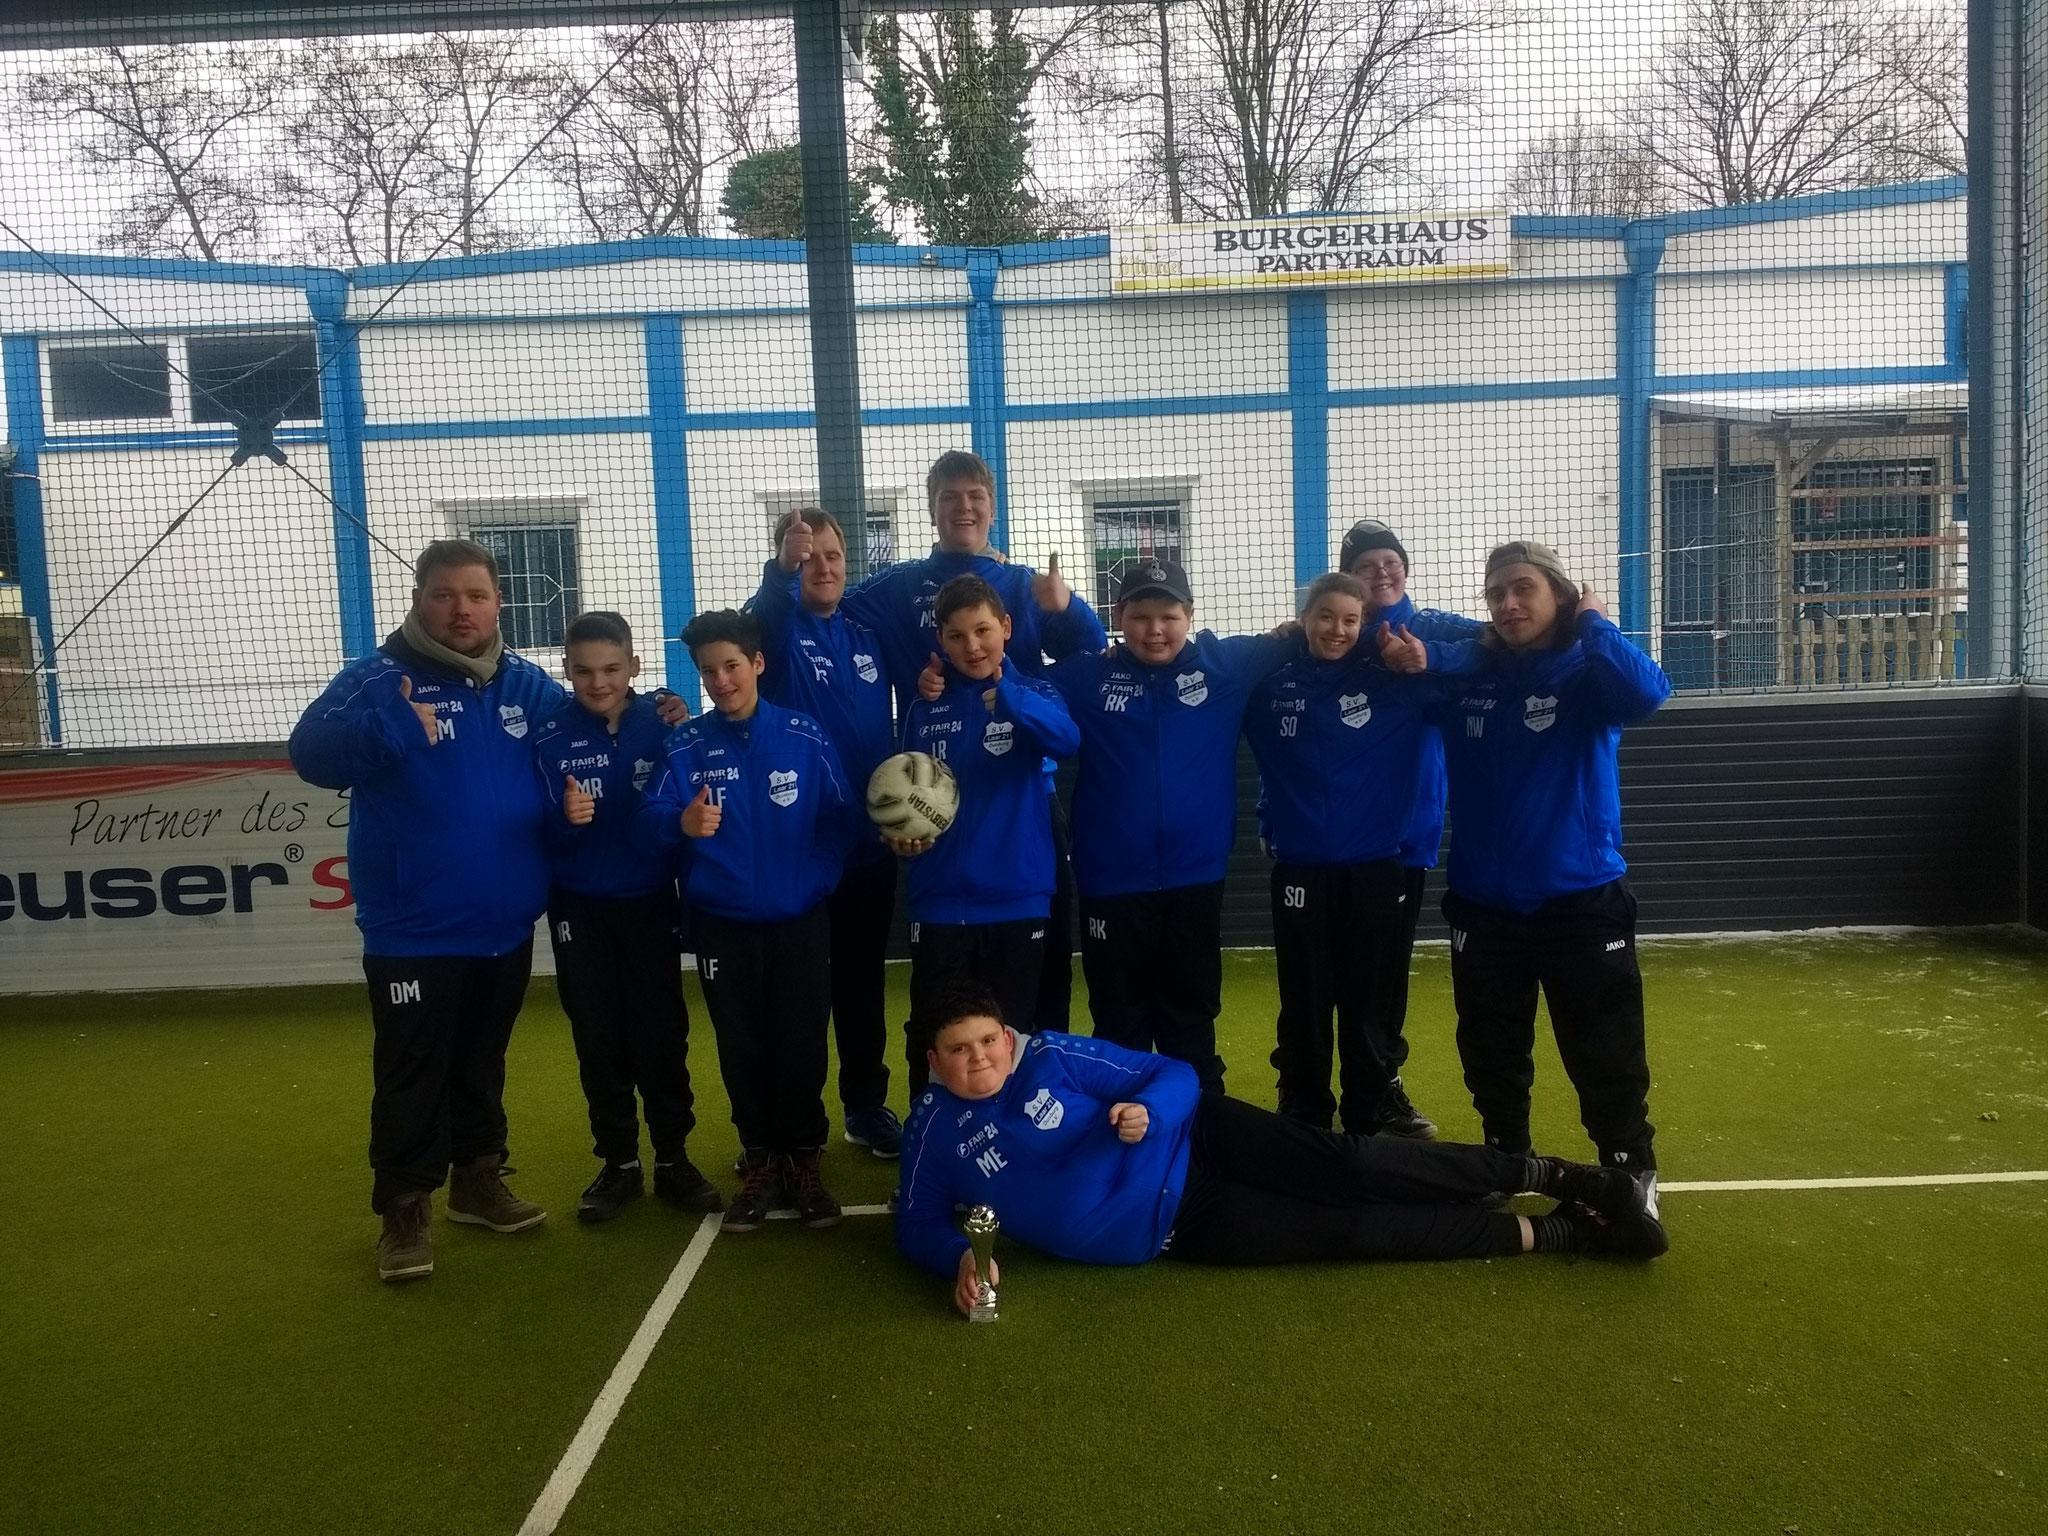 24.März U16 Turnier in Solingen